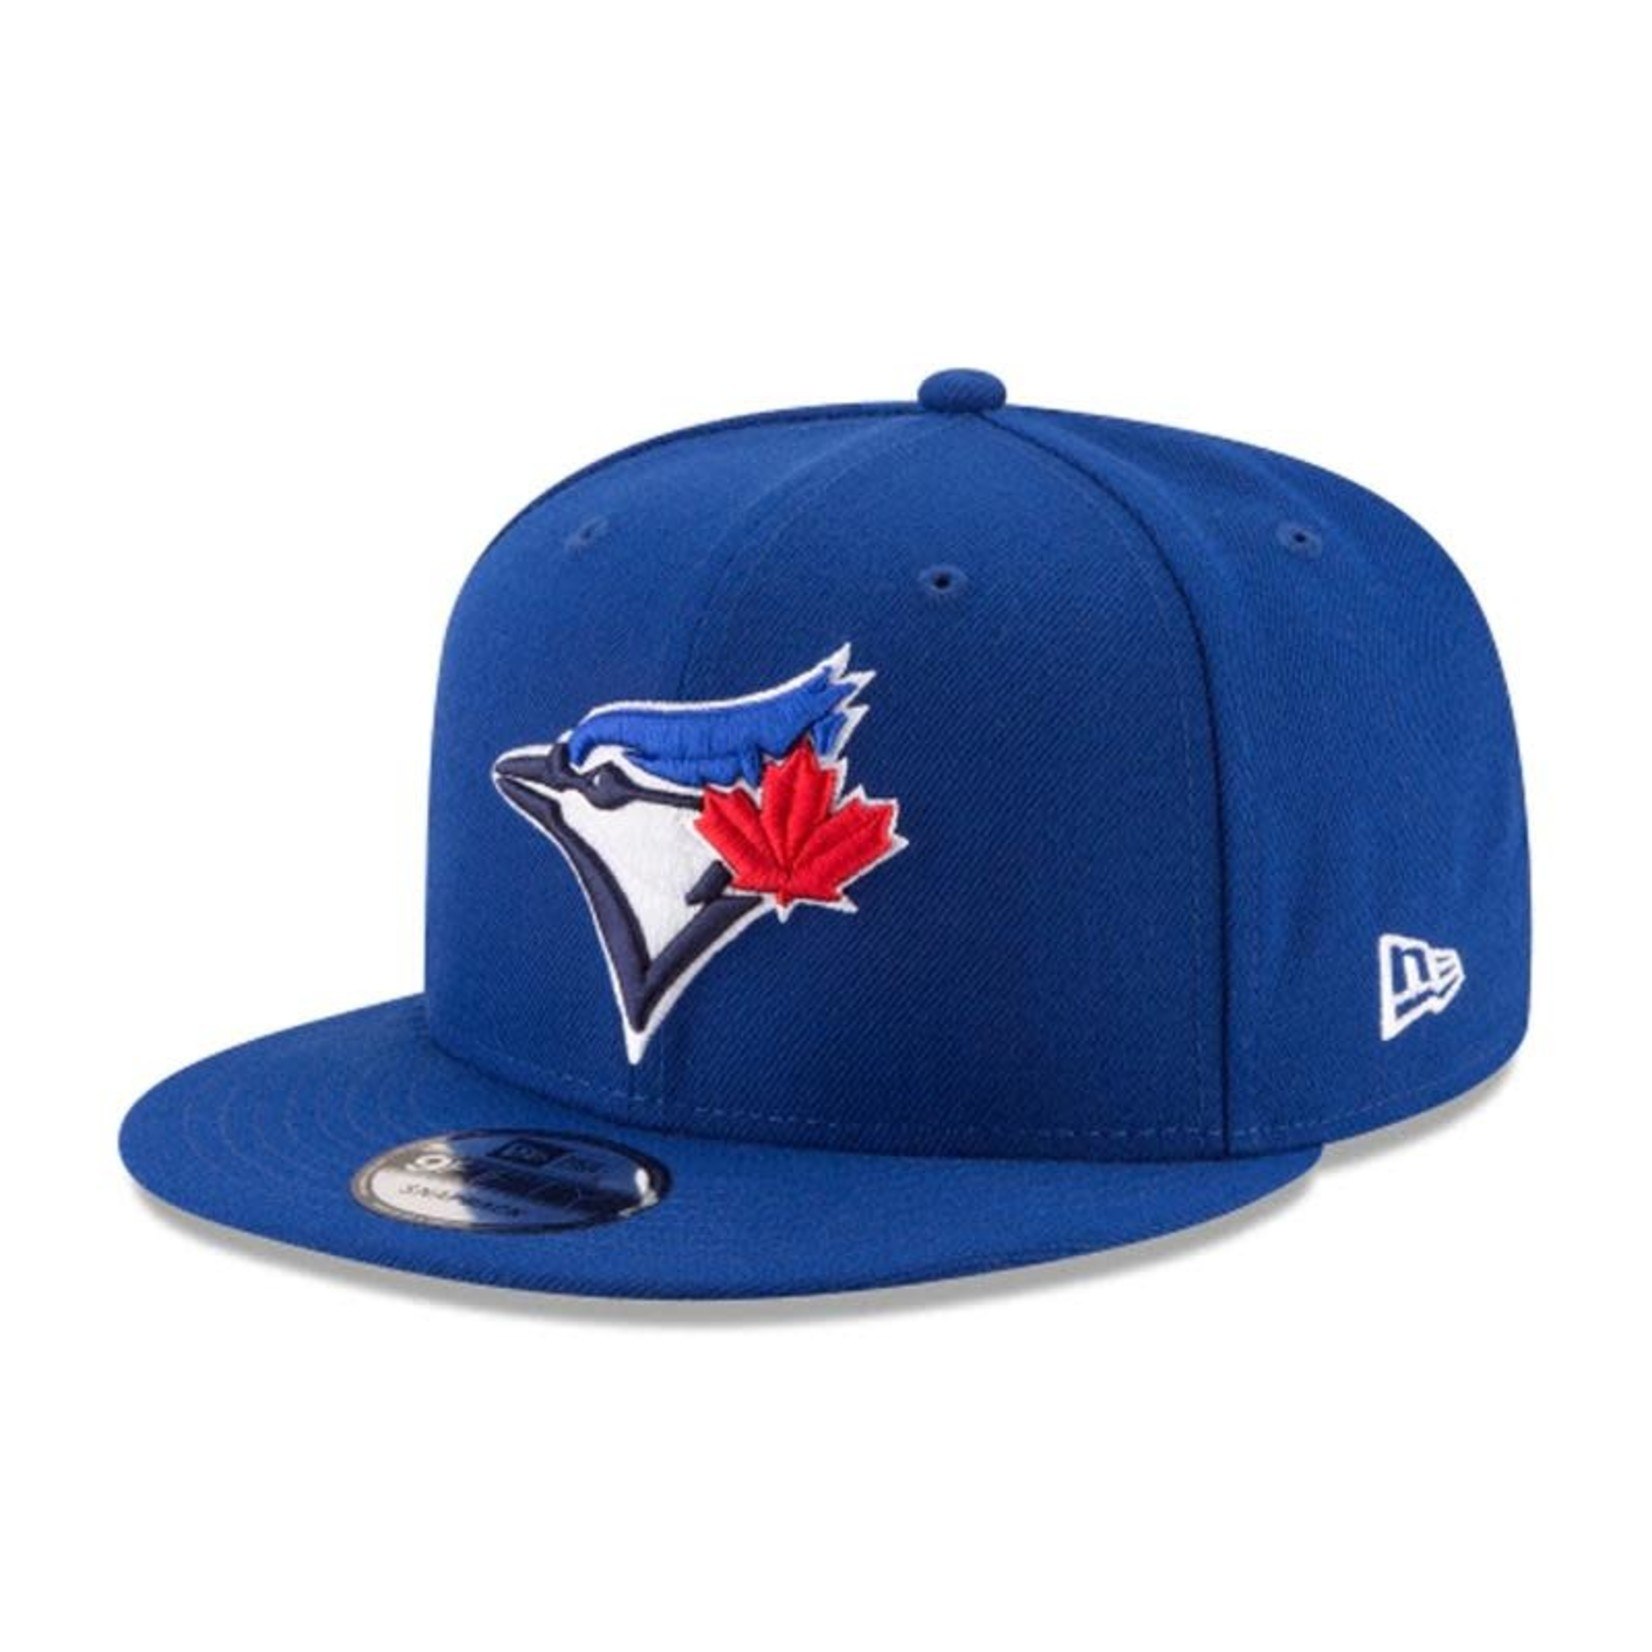 New Era New Era Hat, Basic Snap 950, MLB, Toronto Blue Jays OTC, OS